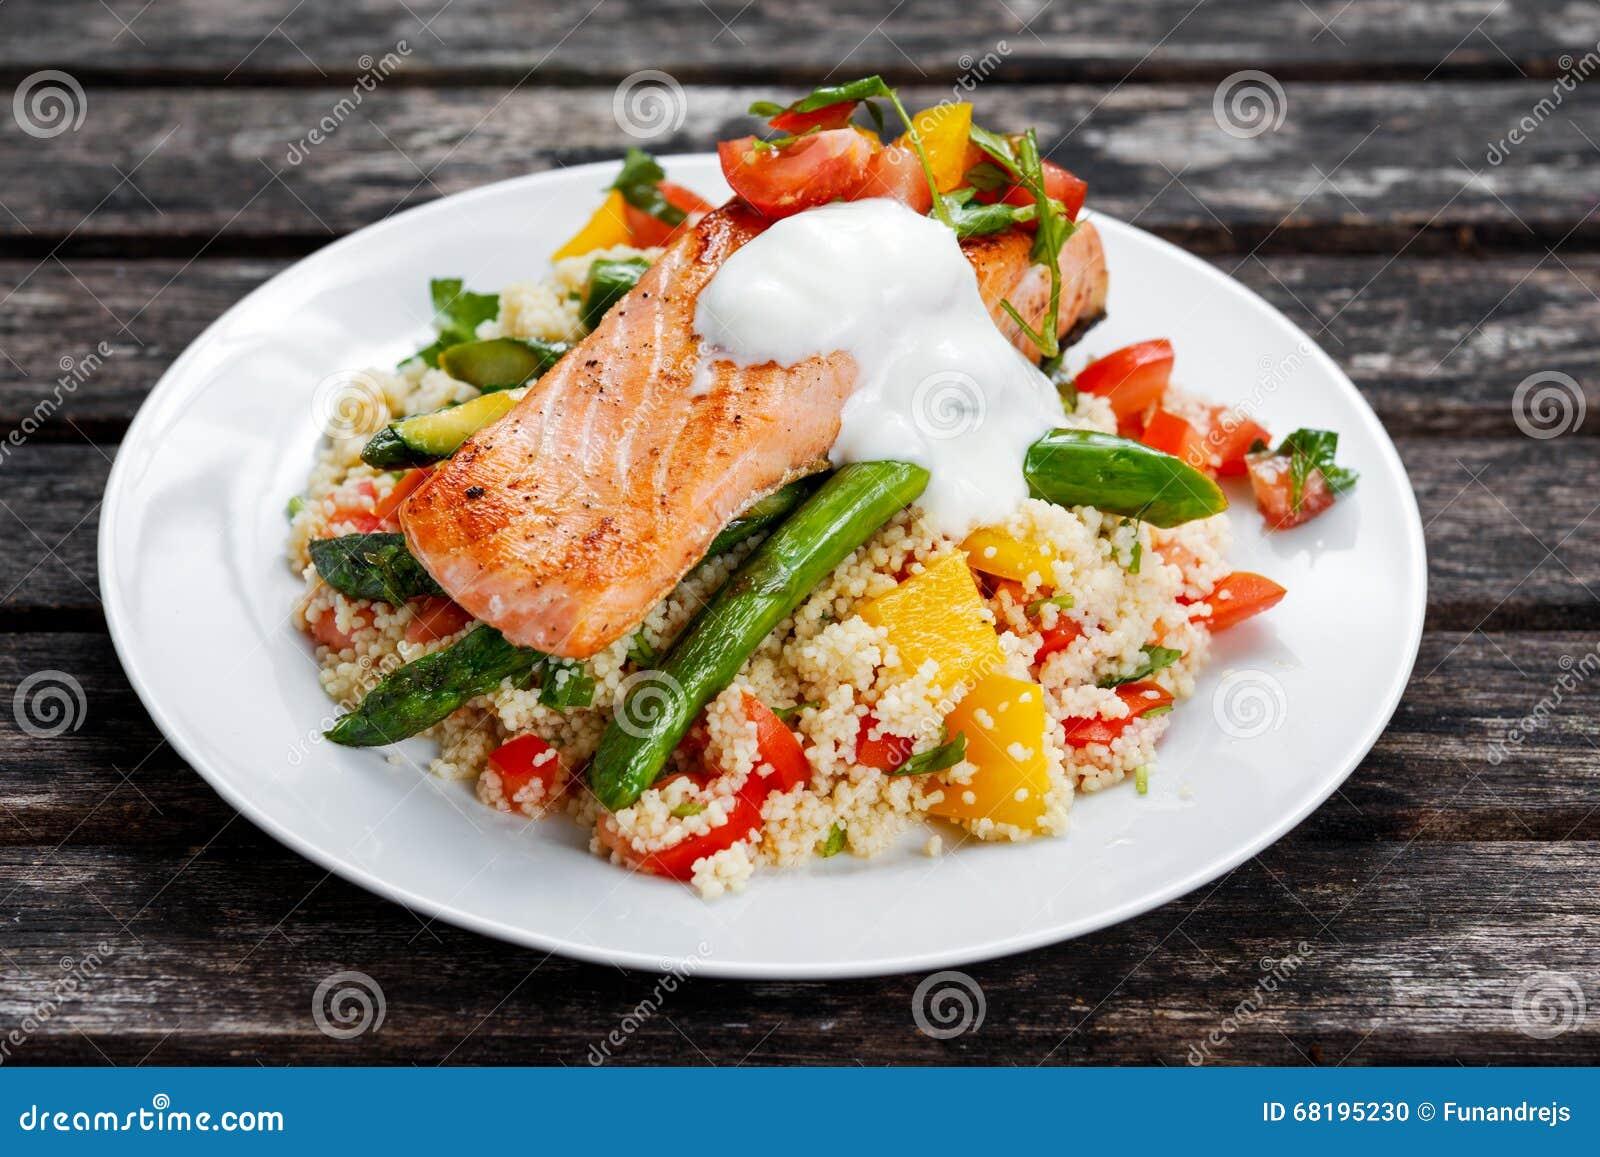 Salmone fritto con asparago, cuscus e le verdure teneri